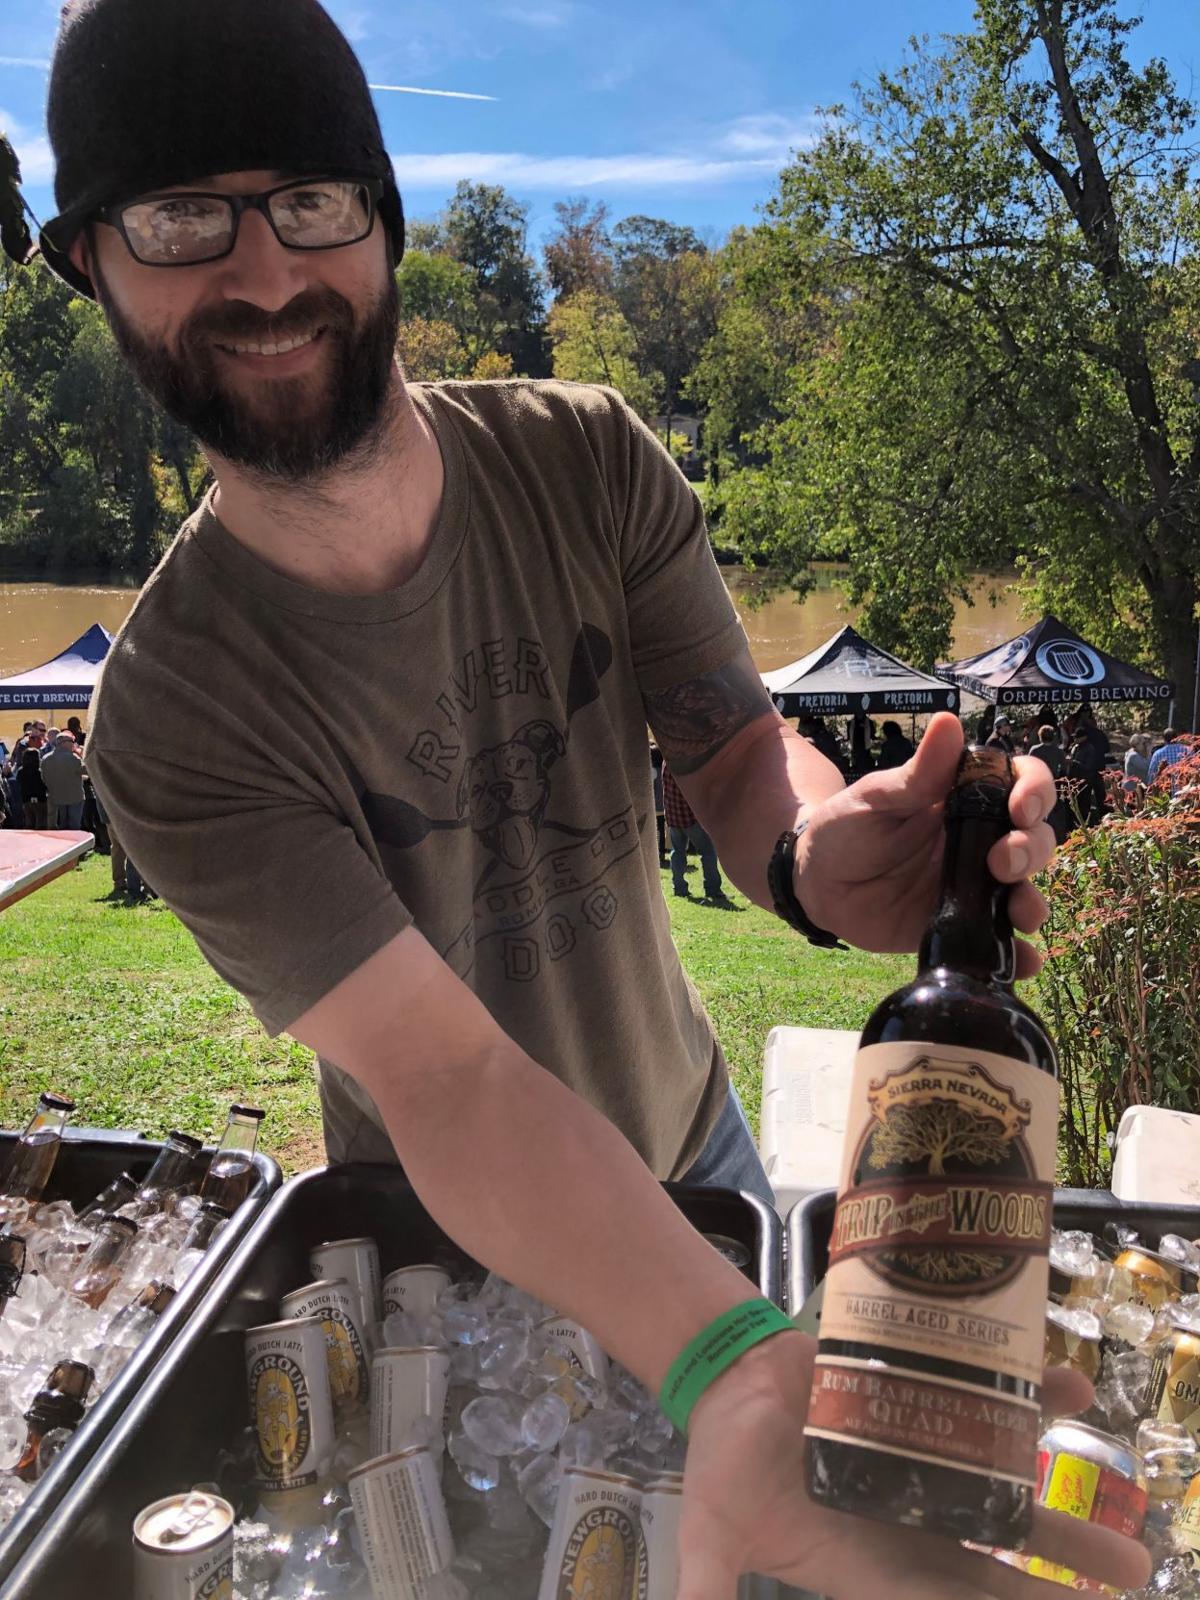 Rome Beer Fest 2019 benefits local arts